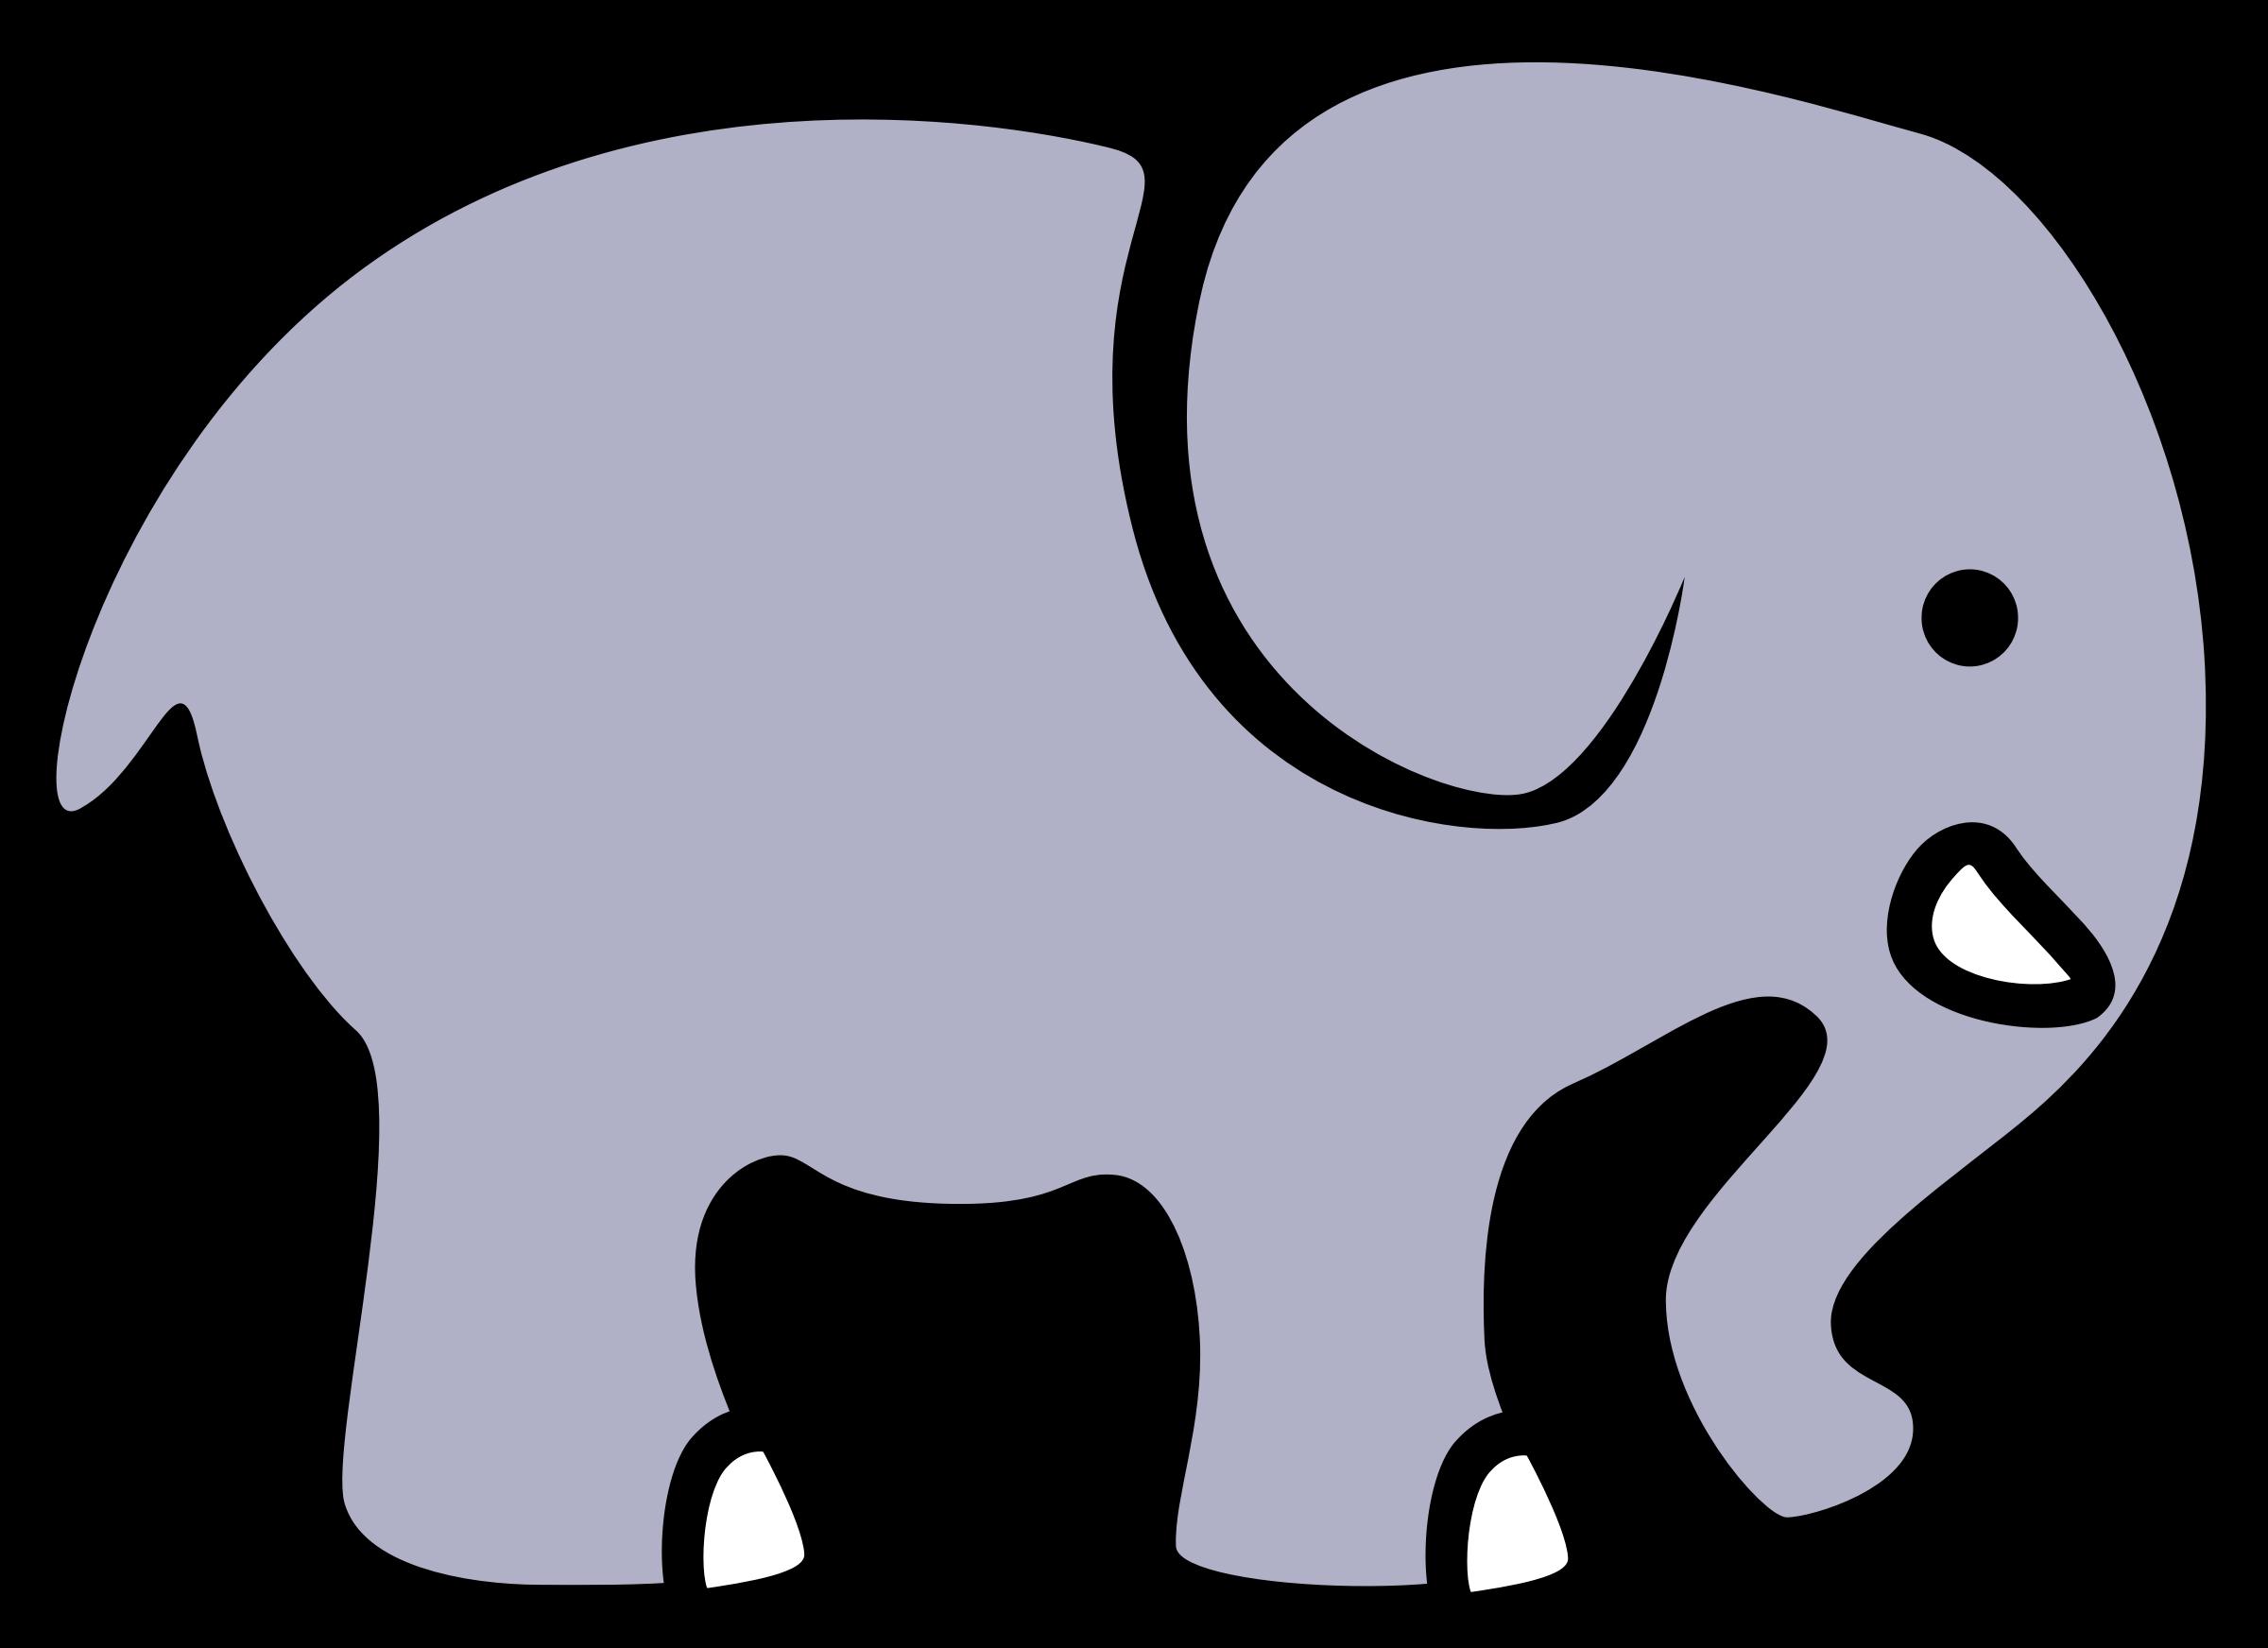 d cartoon by. Lavender clipart elephant